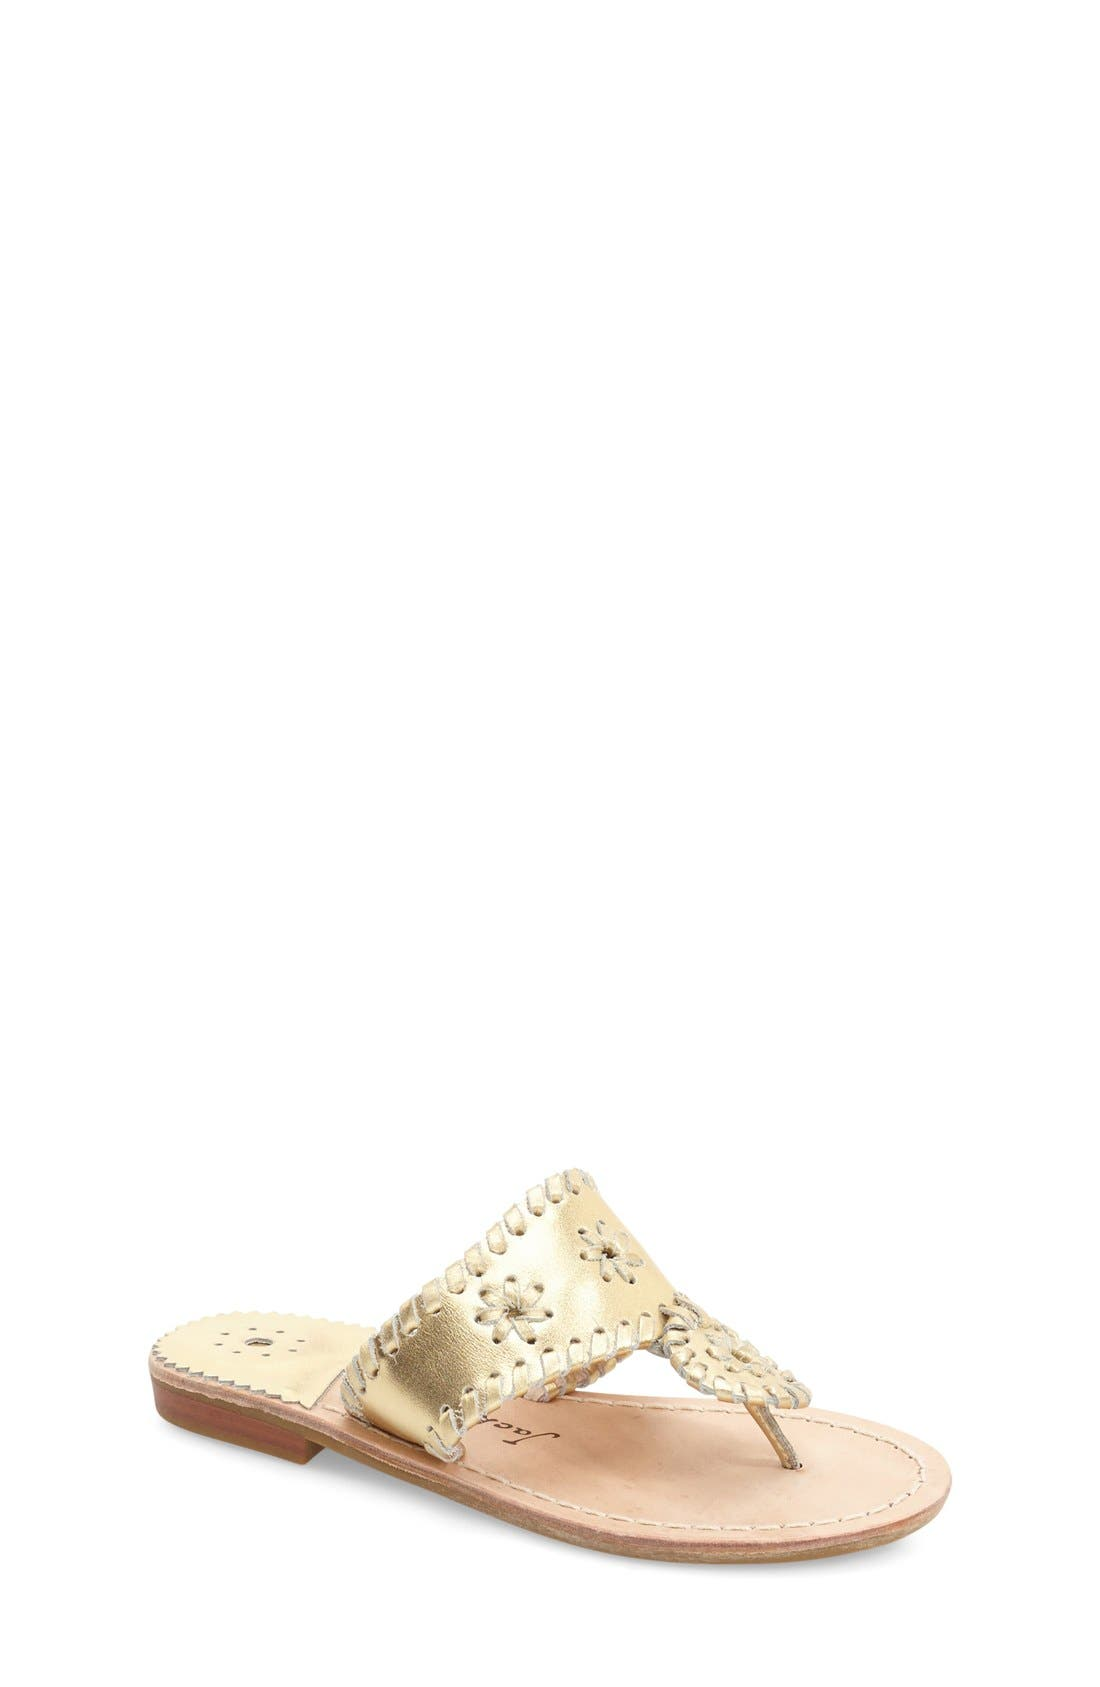 JACK ROGERS 'Miss Hamptons' Sandal, Main, color, GOLD